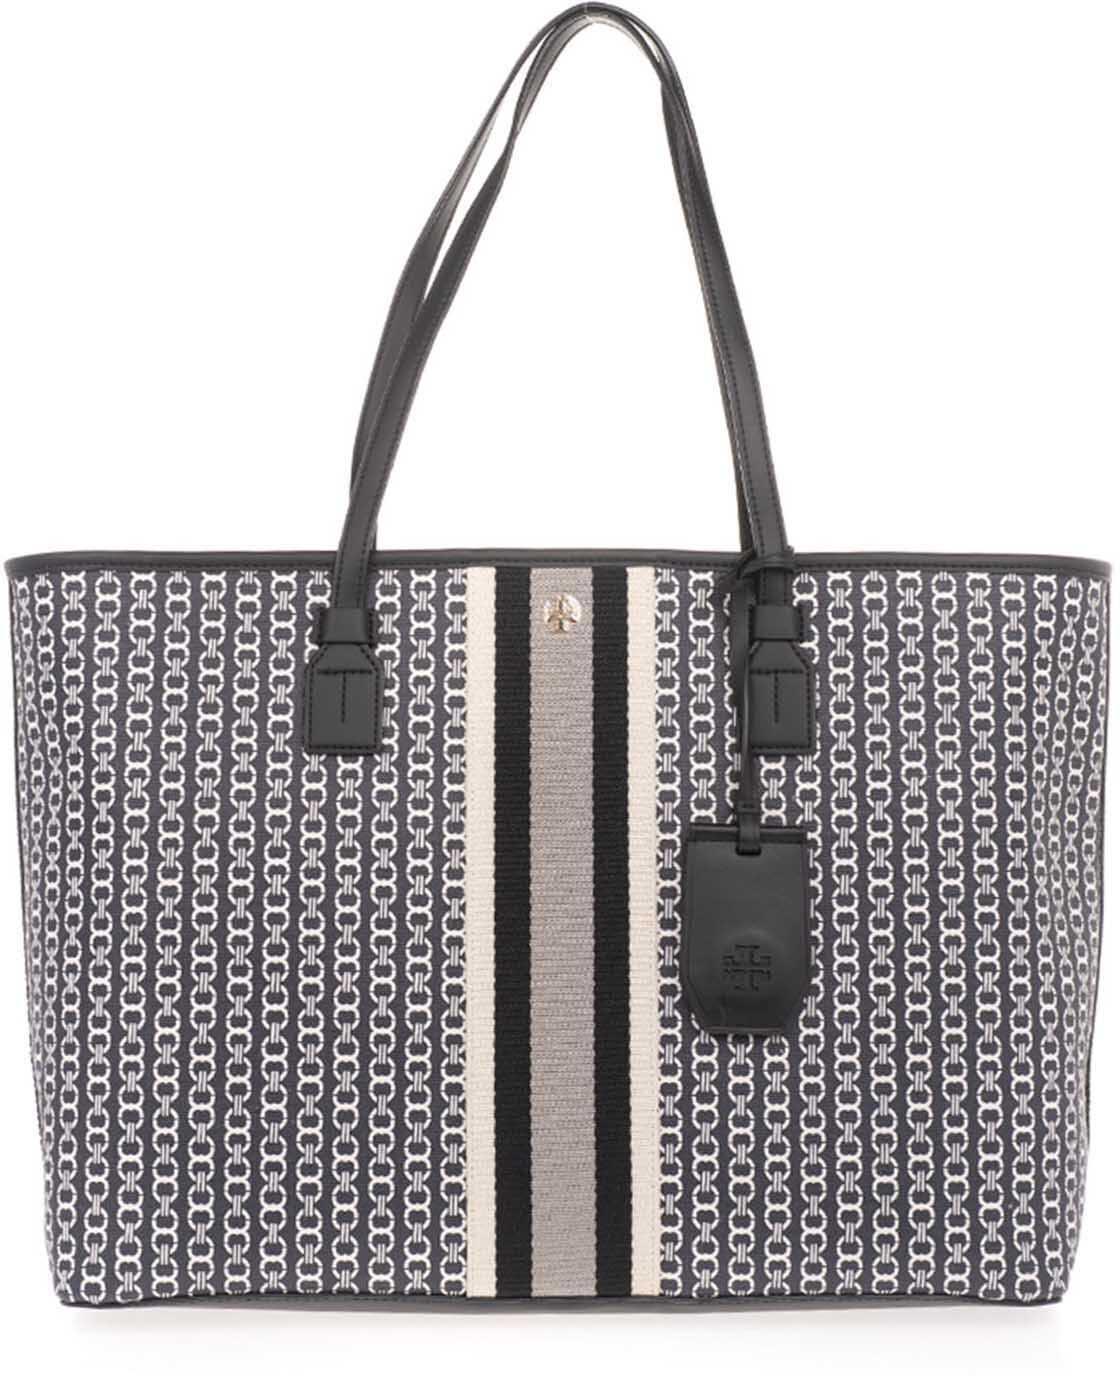 Tory Burch Gemini Link Canvas Tote Bag In Black 58450 892 Black imagine b-mall.ro